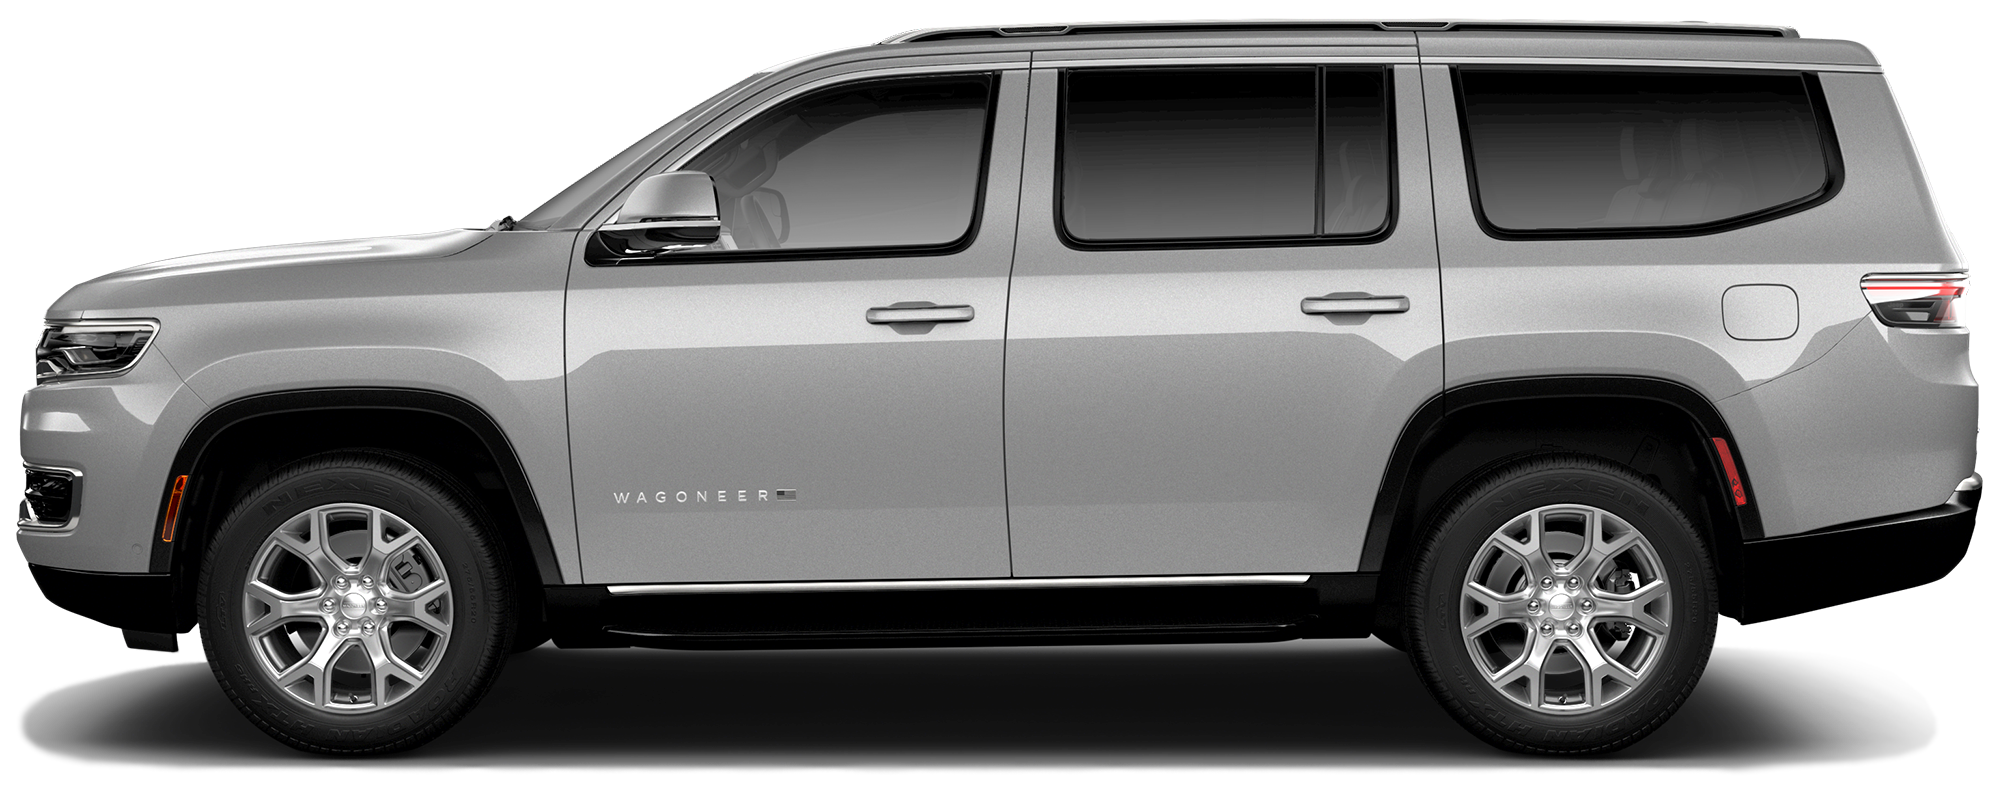 2022 Jeep Wagoneer SUV Series II